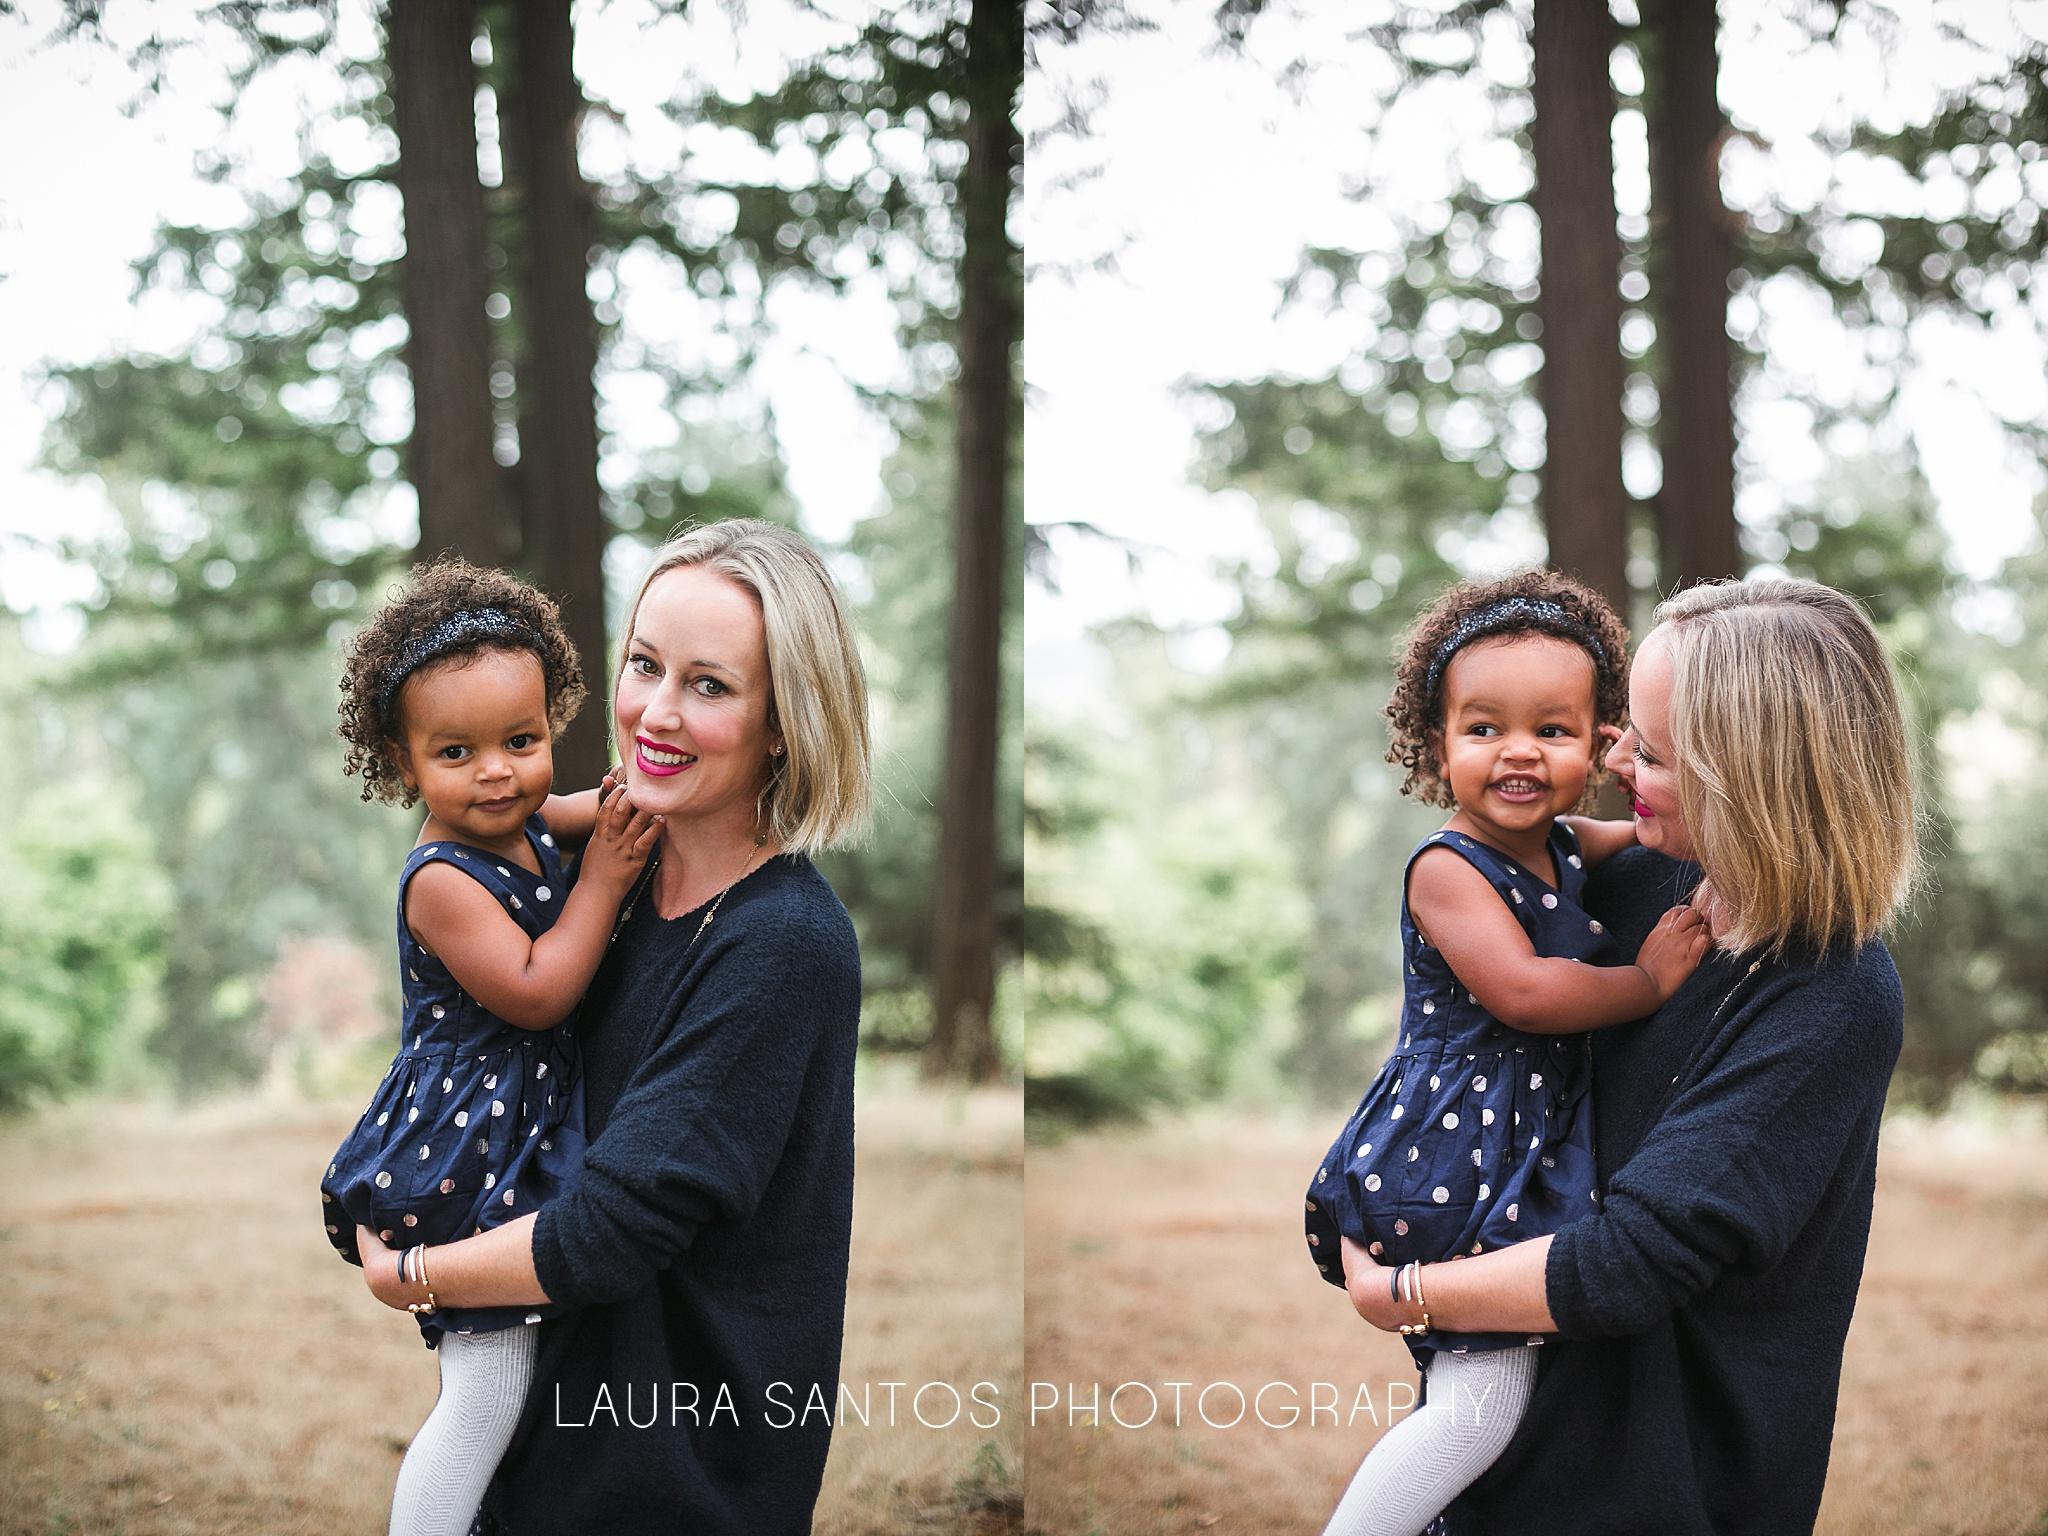 Laura Santos Photography Portland Oregon Family Photographer_0703.jpg